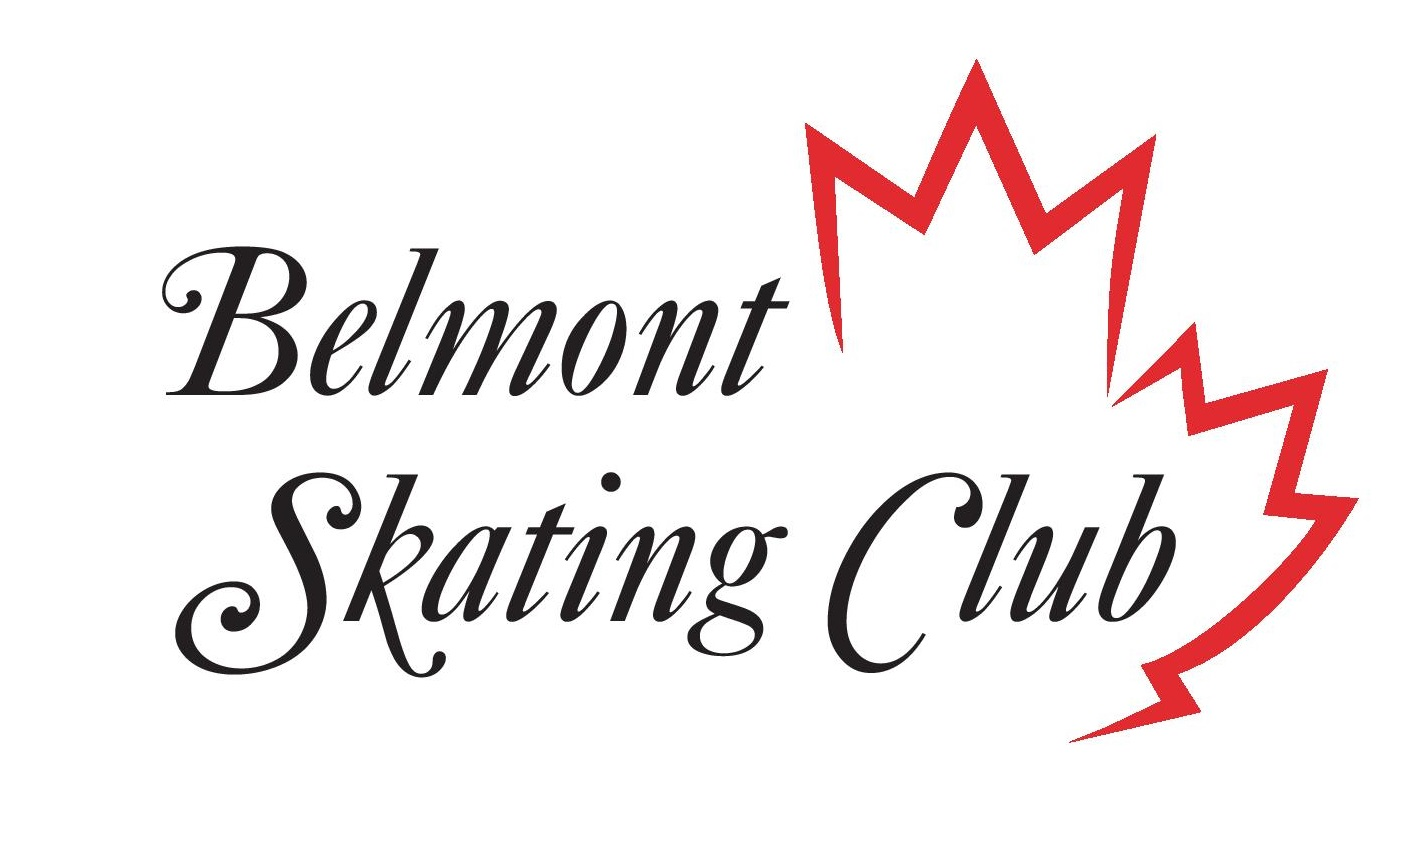 Belmont Skating Club